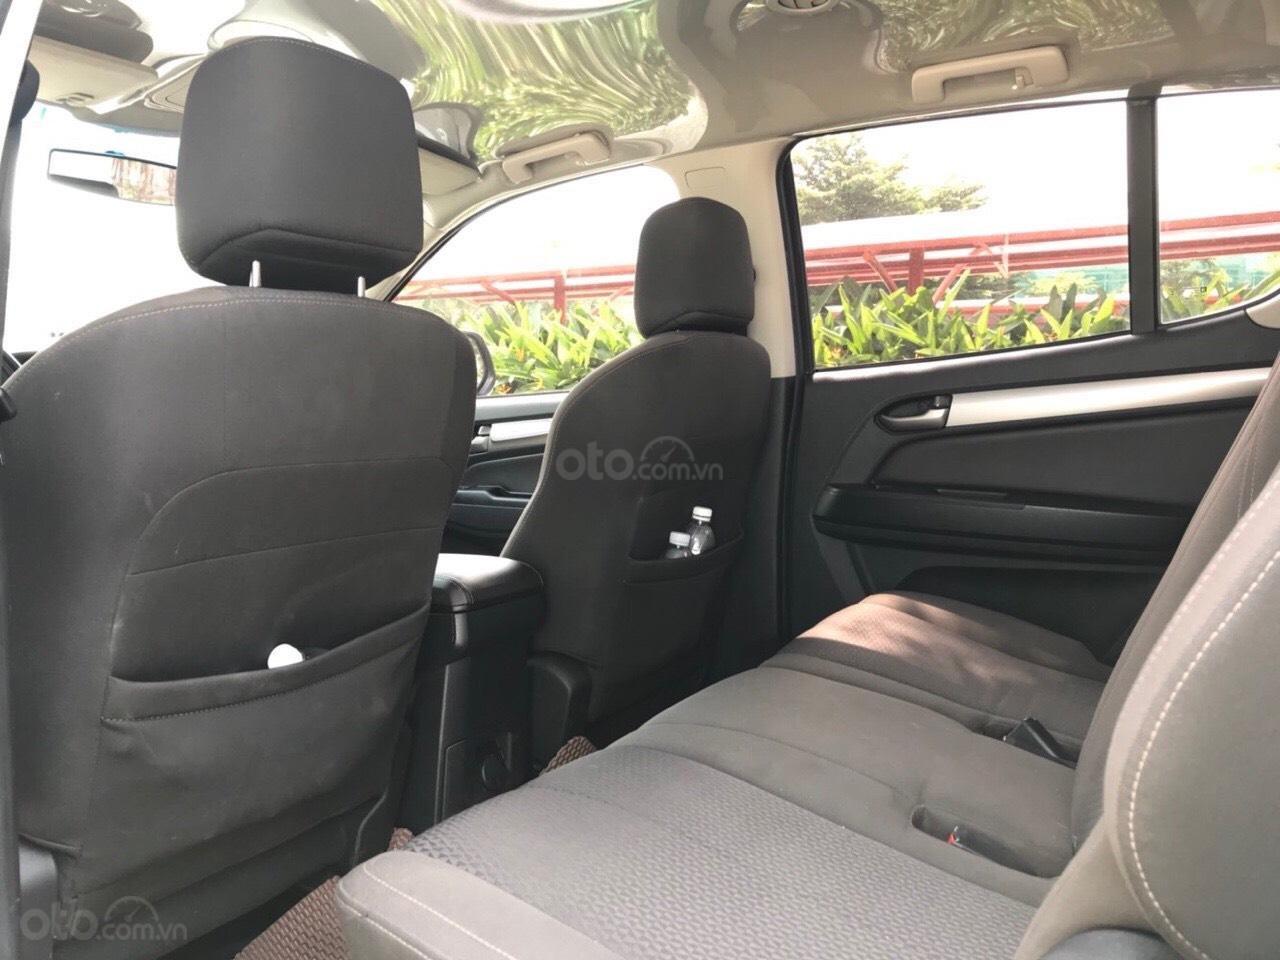 Bán xe Chevrolet Trailblazer Premium 2018 (4)